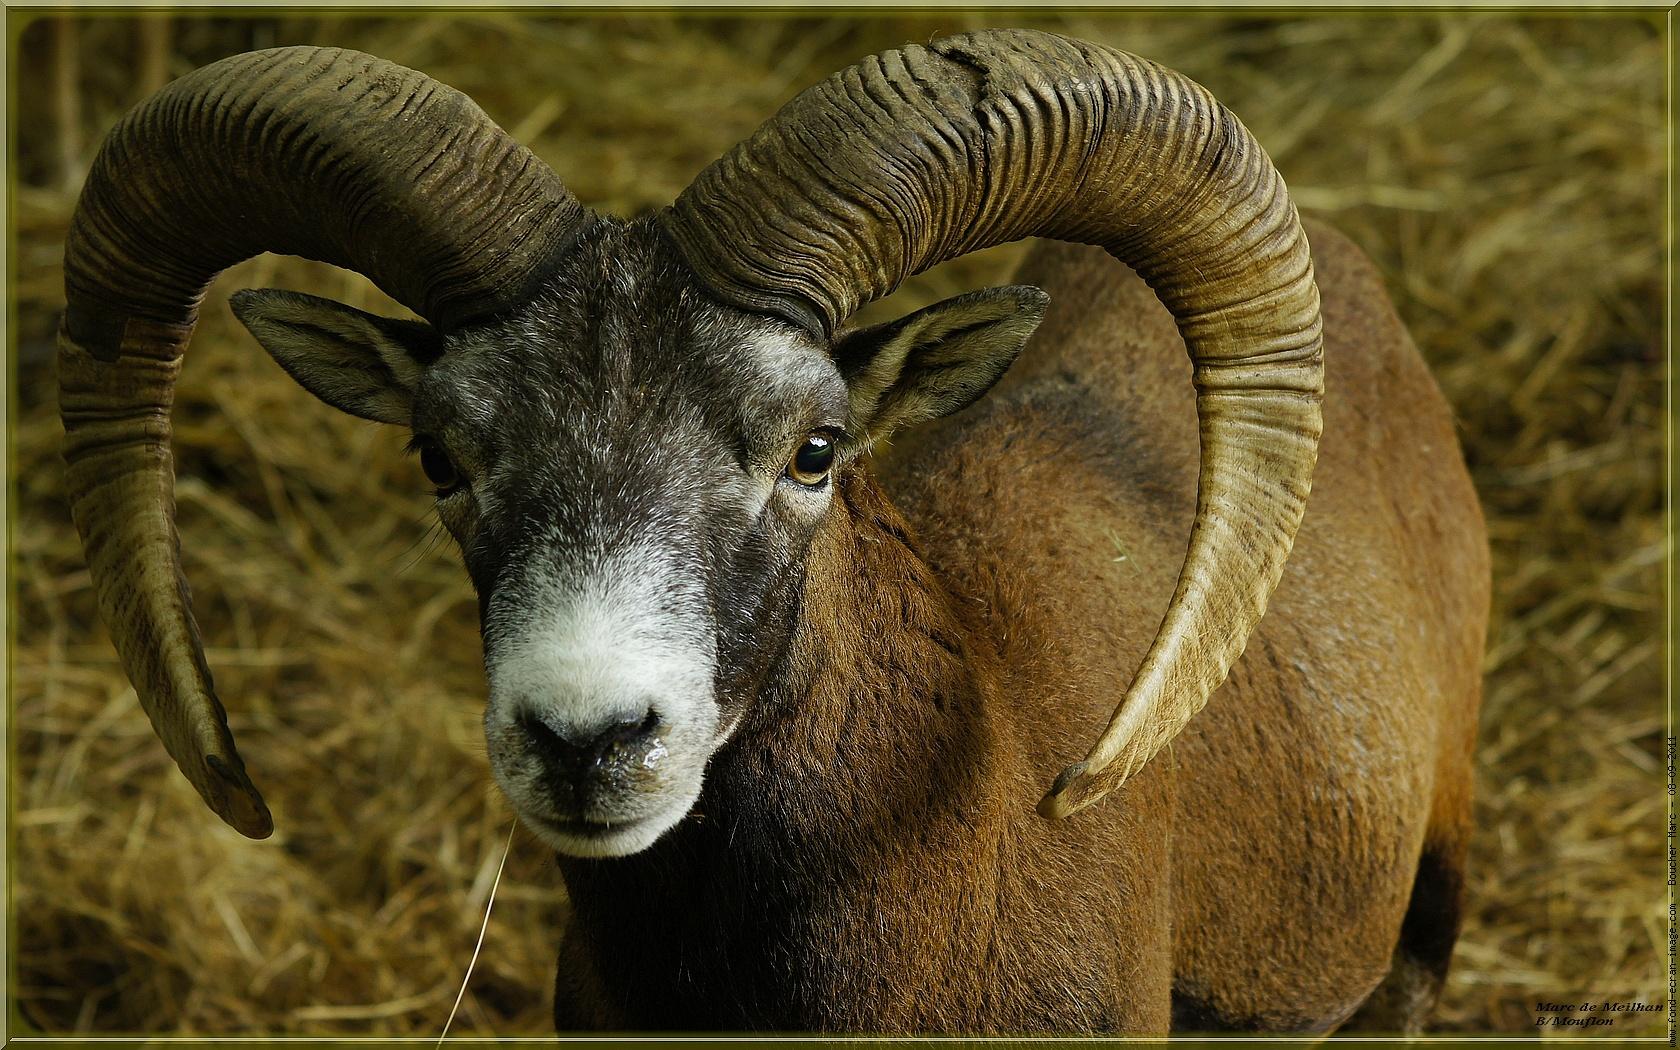 Best 58 Mouflon Wallpaper on HipWallpaper Mouflon Wallpaper 1680x1050